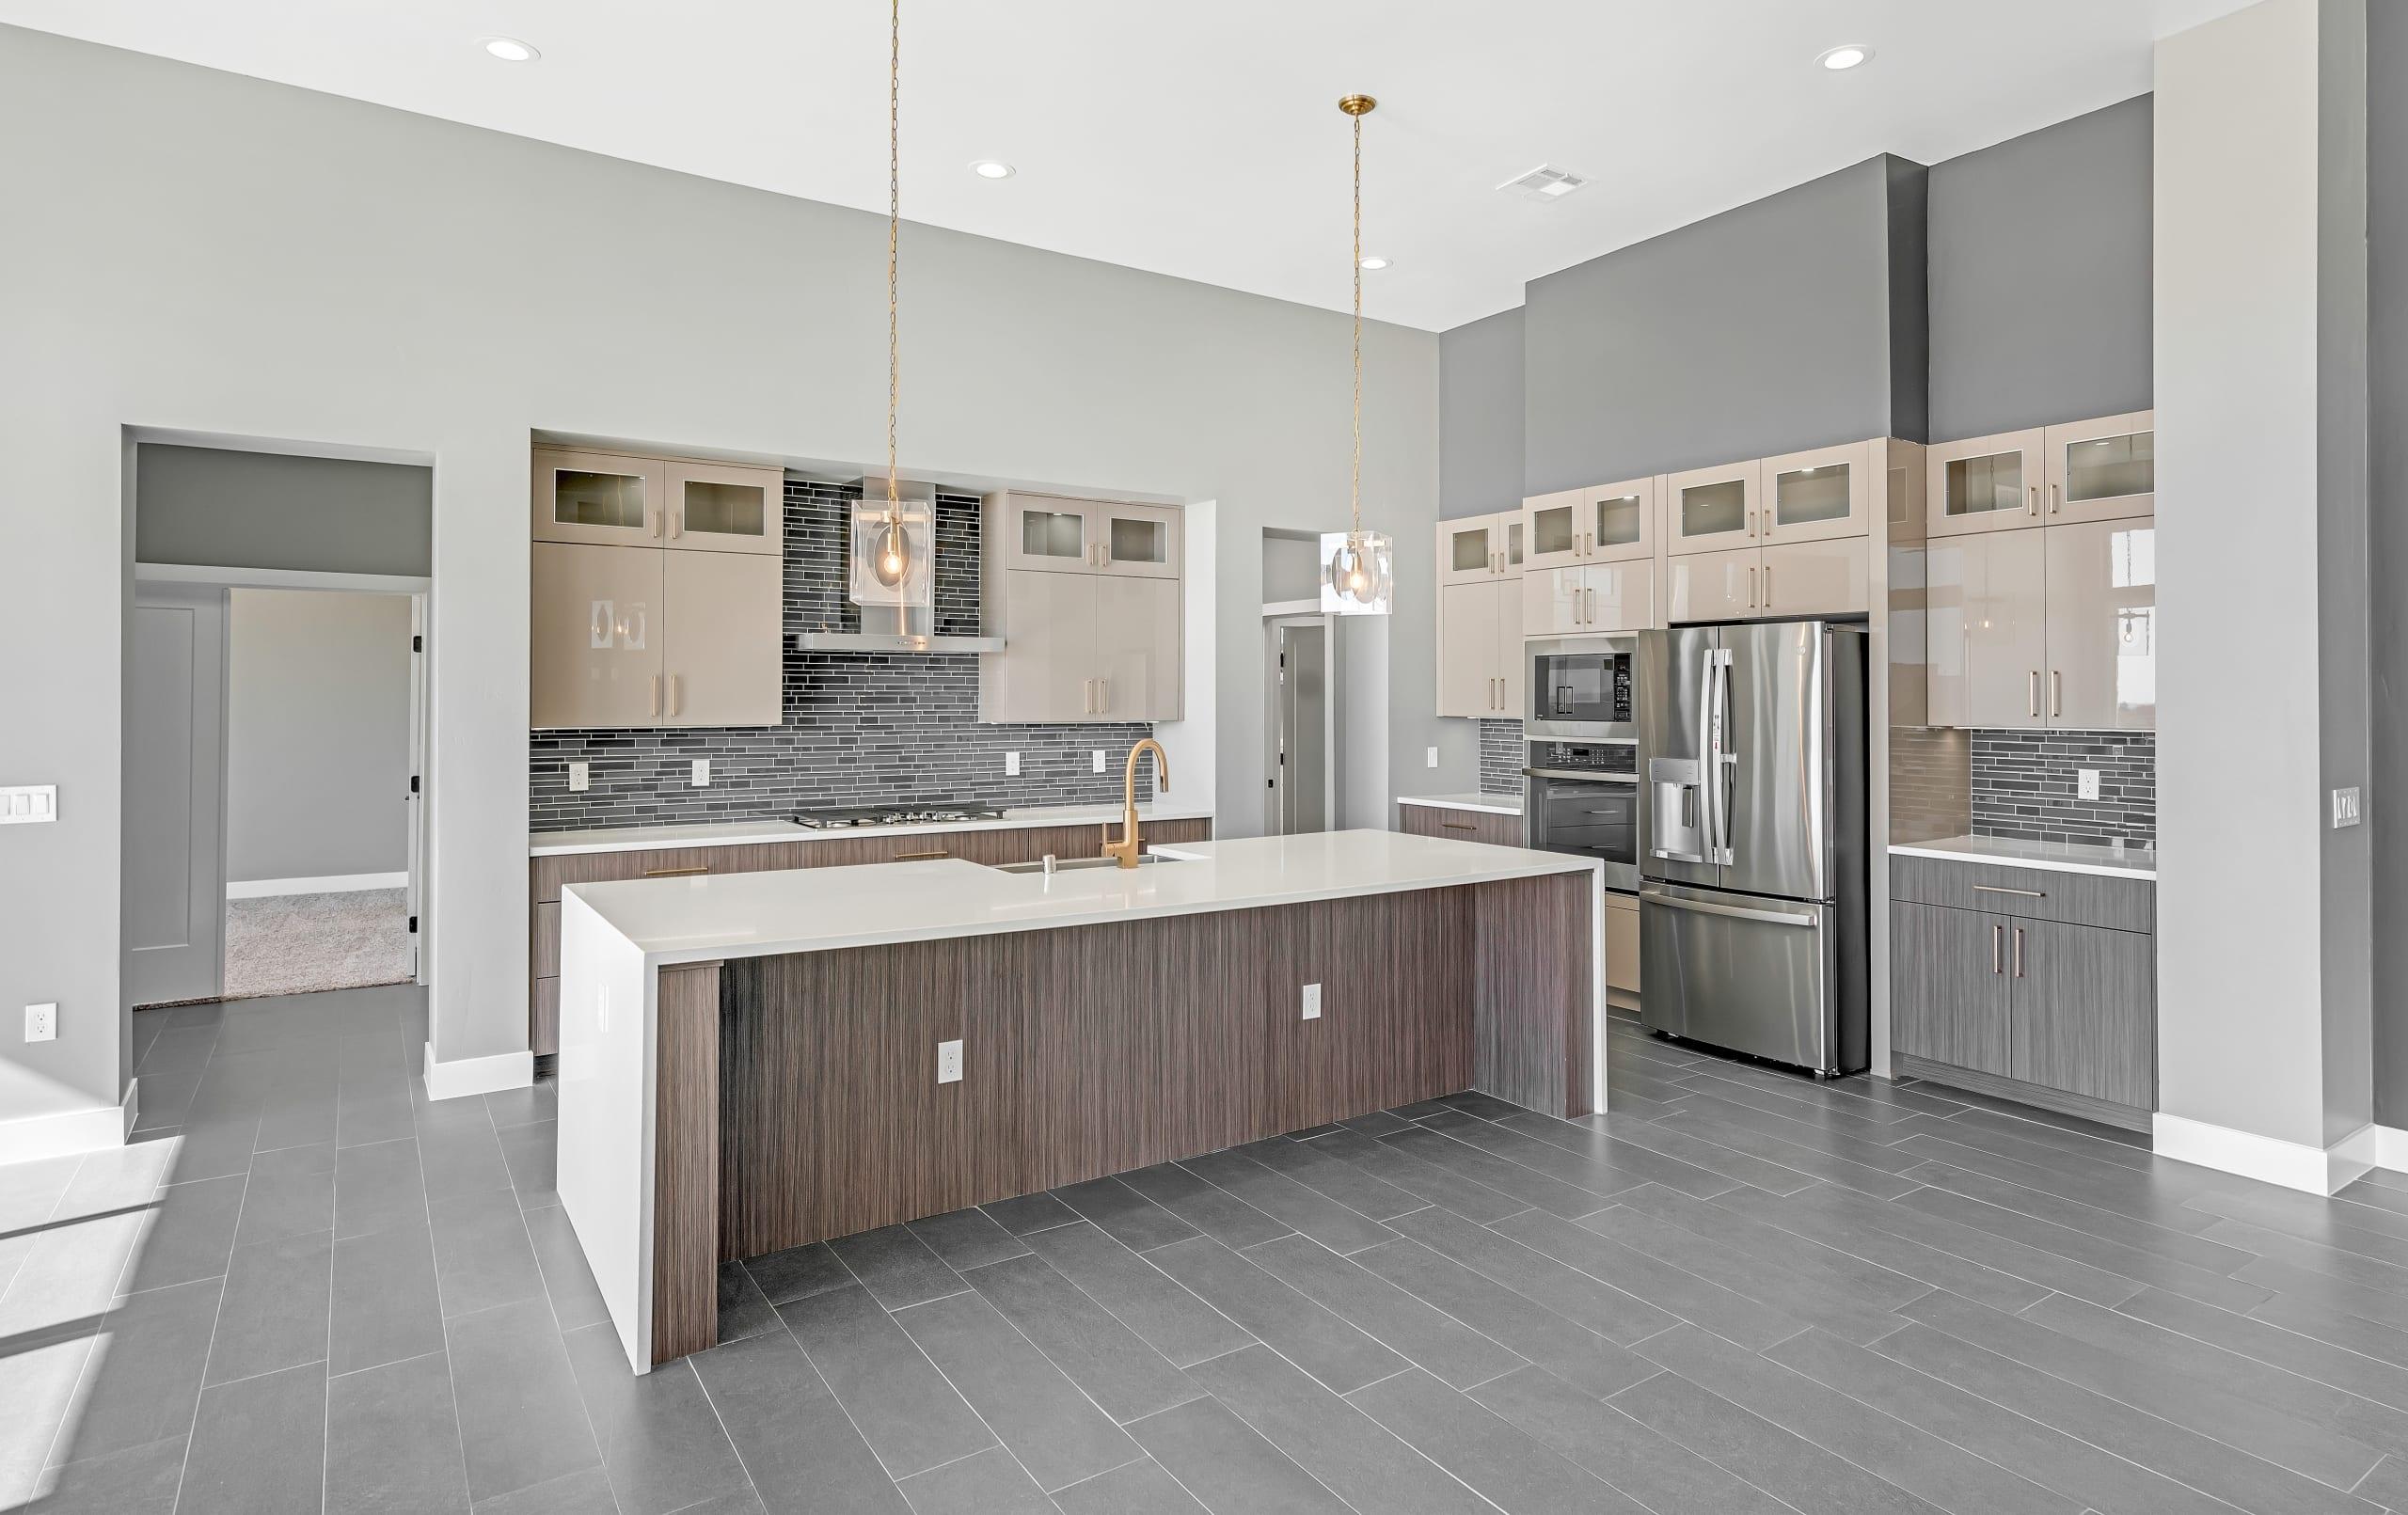 2914 East Springs - Kitchen - Island, appliances, full kitchen view